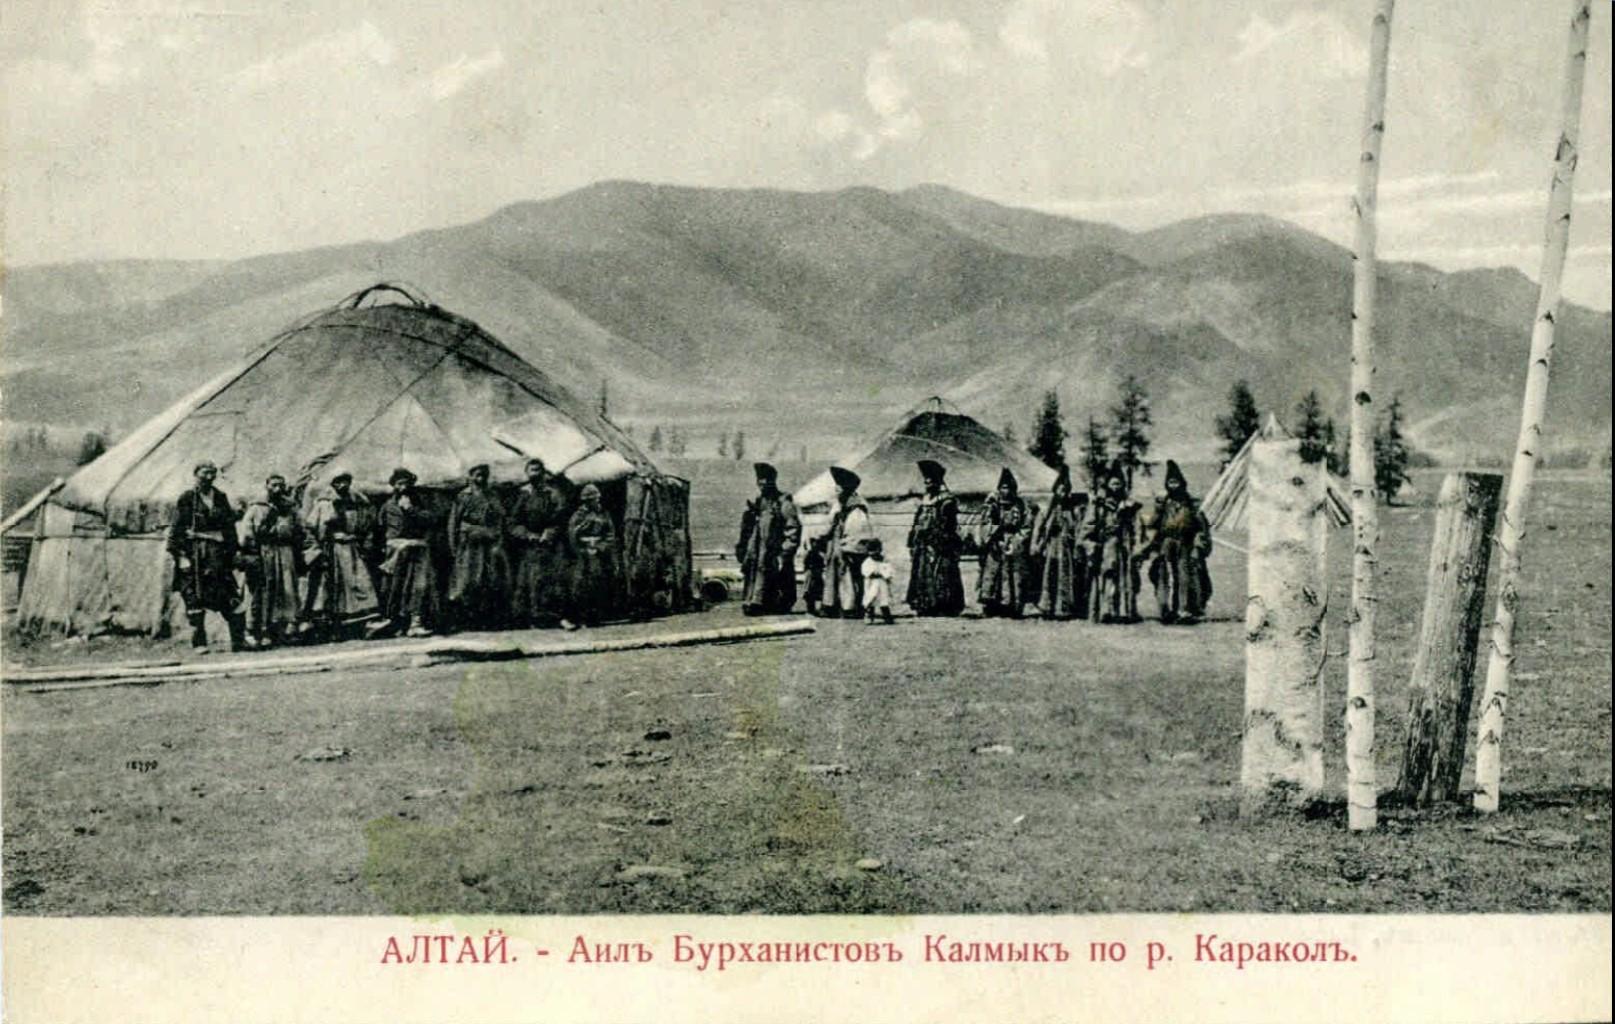 Аил Бурханистов Калмык по р. Каракол